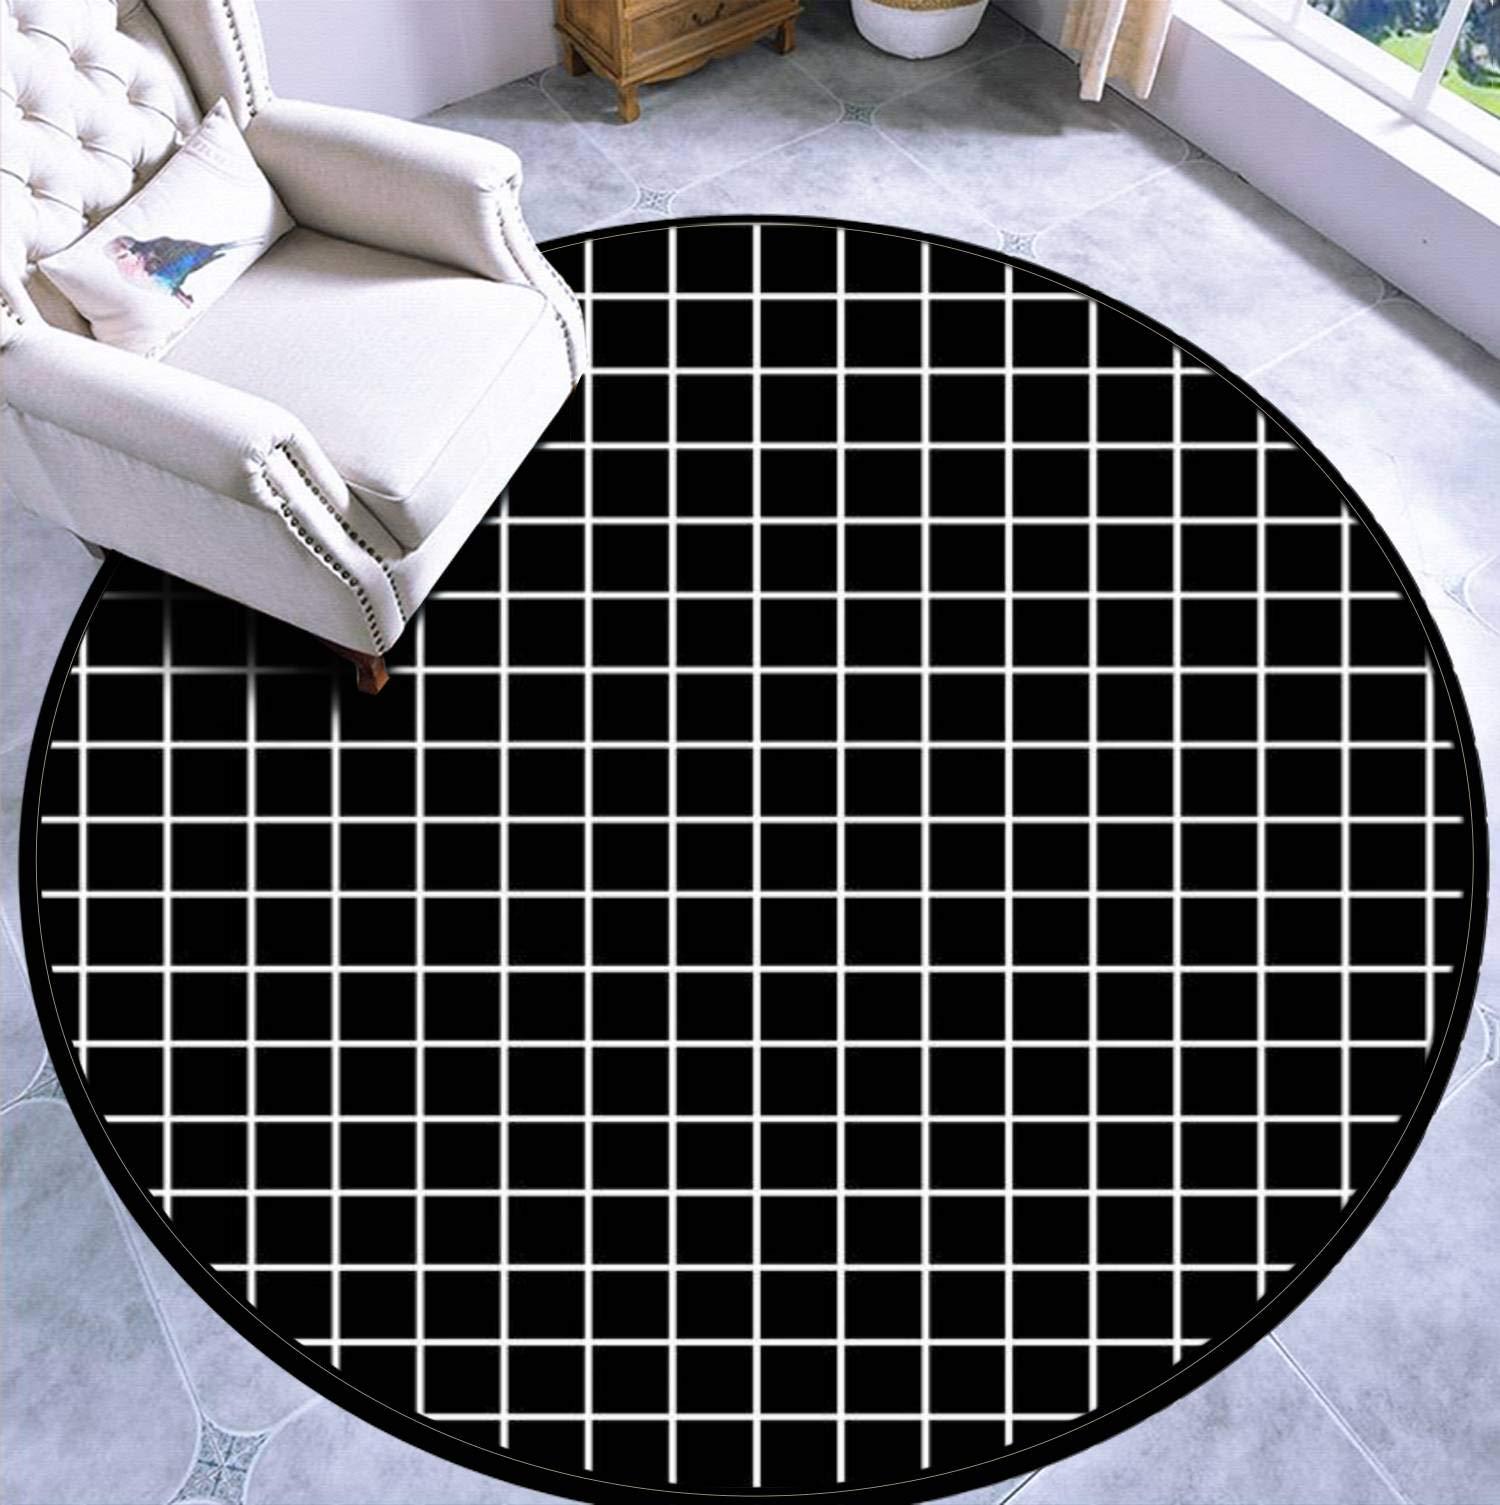 Round Area Rug Kids Carpet Playmat Non-Slip Throw Runner Rug Black GRIDS Design Indoor Floor Carpet Door Mat for Bedroom Living Room Home Decor by APED DECOR